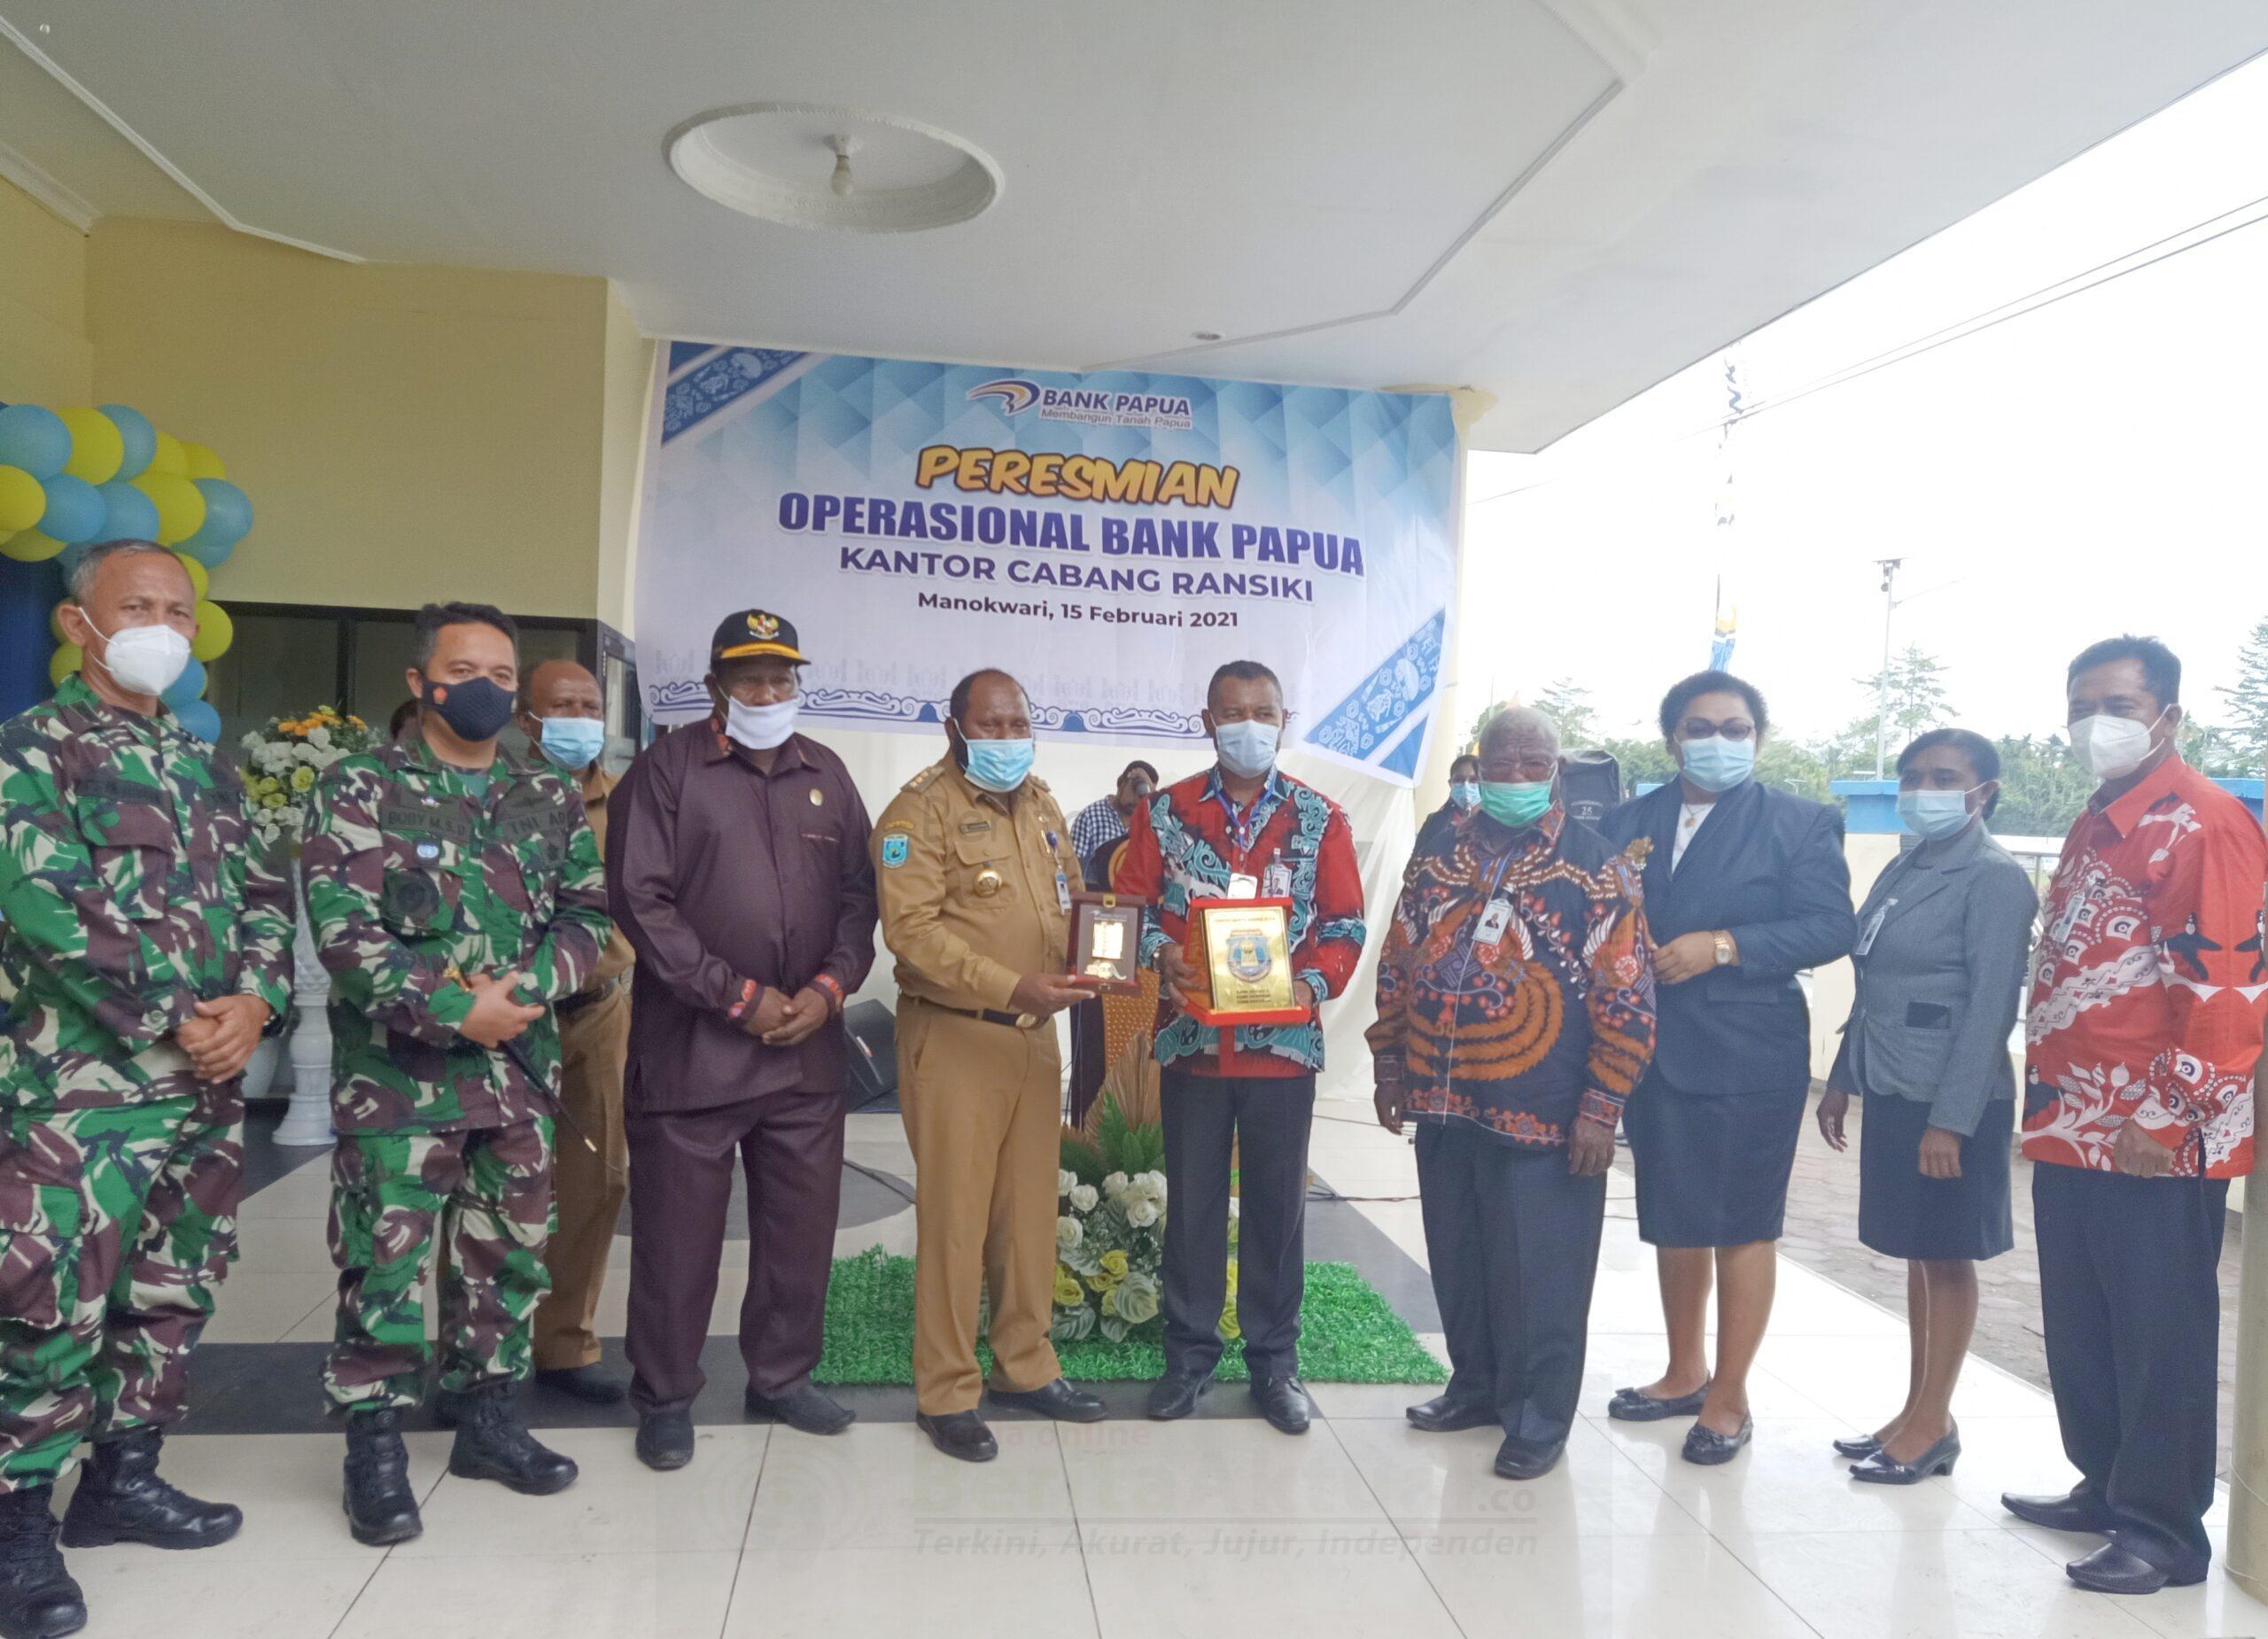 Bupati Manokwari Selatan, Resmikan KCP Ransiki Menjadi Kantor Cabang Bank Papua 7 IMG 20210215 224557 scaled